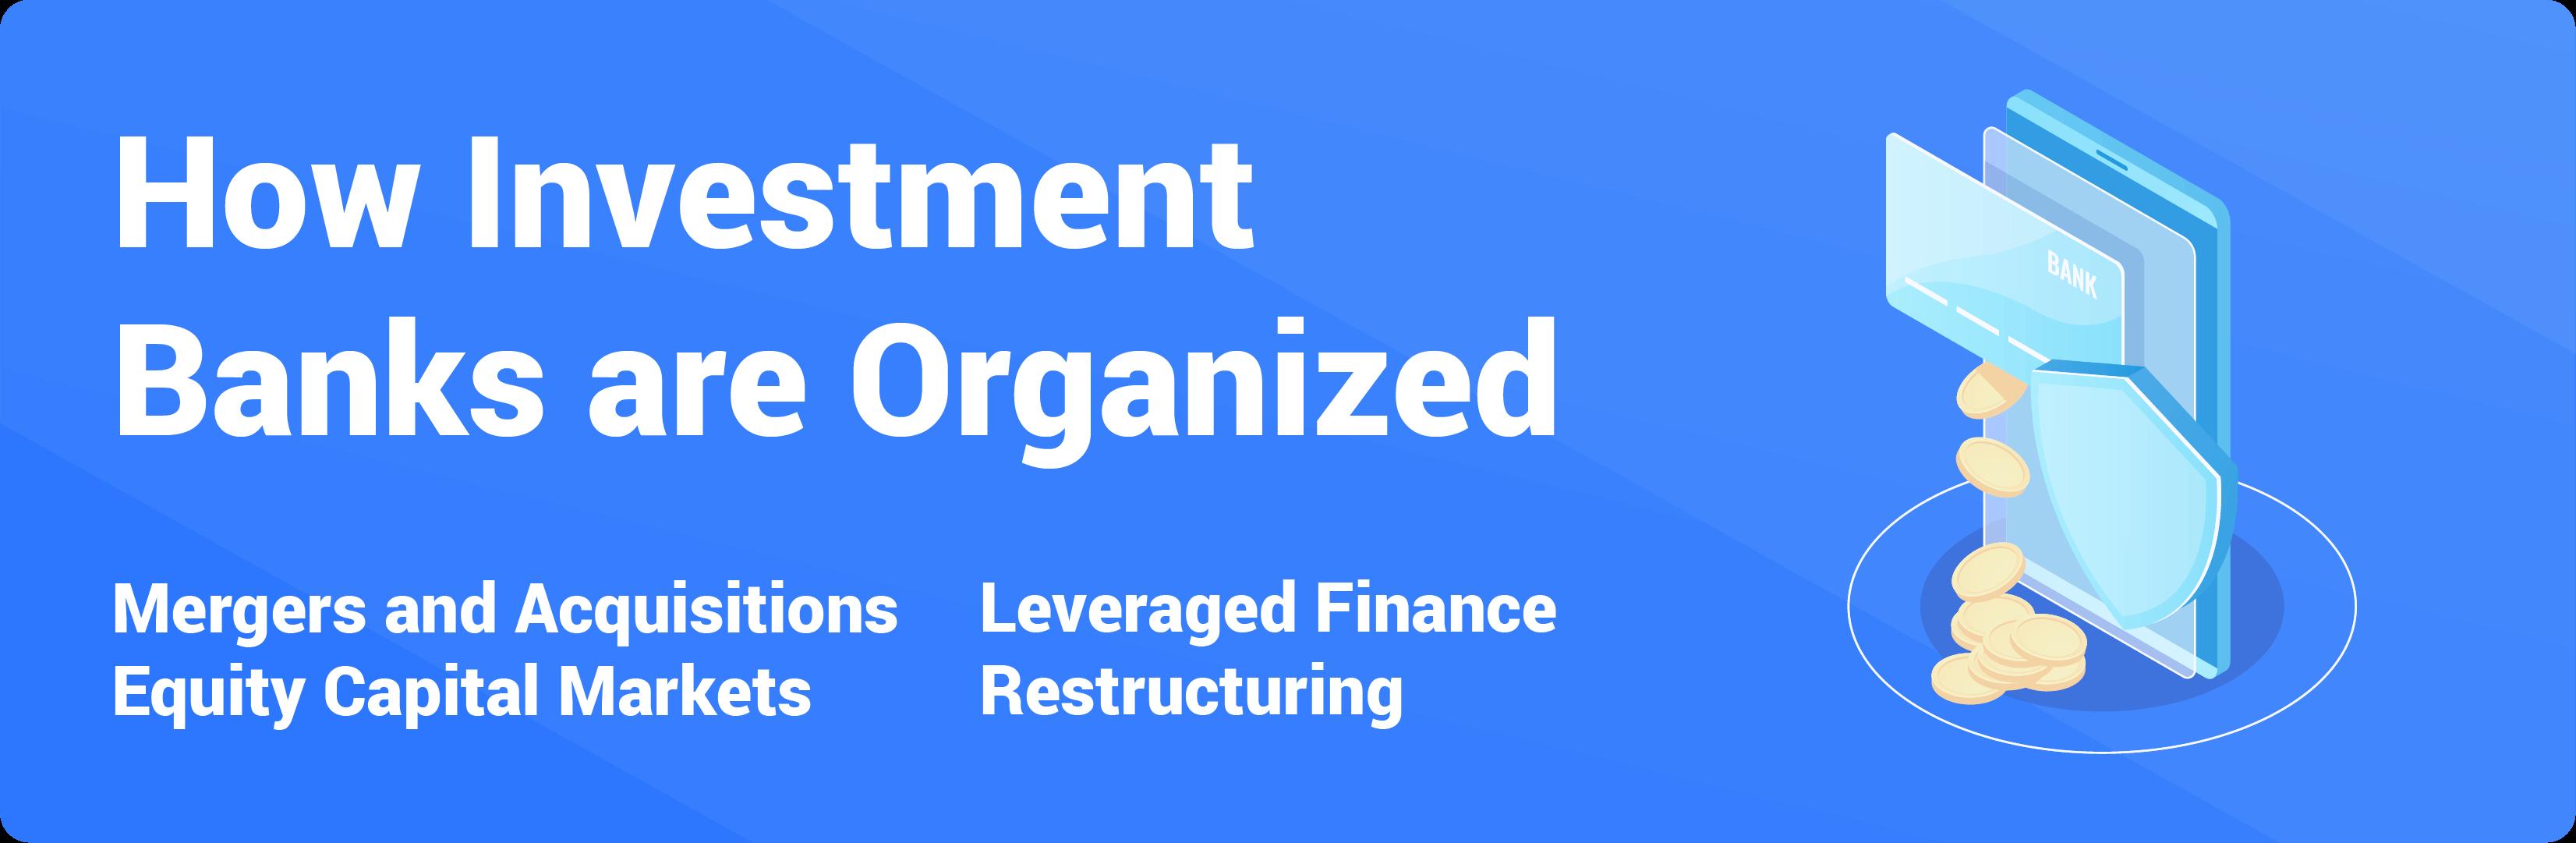 investment banks organization